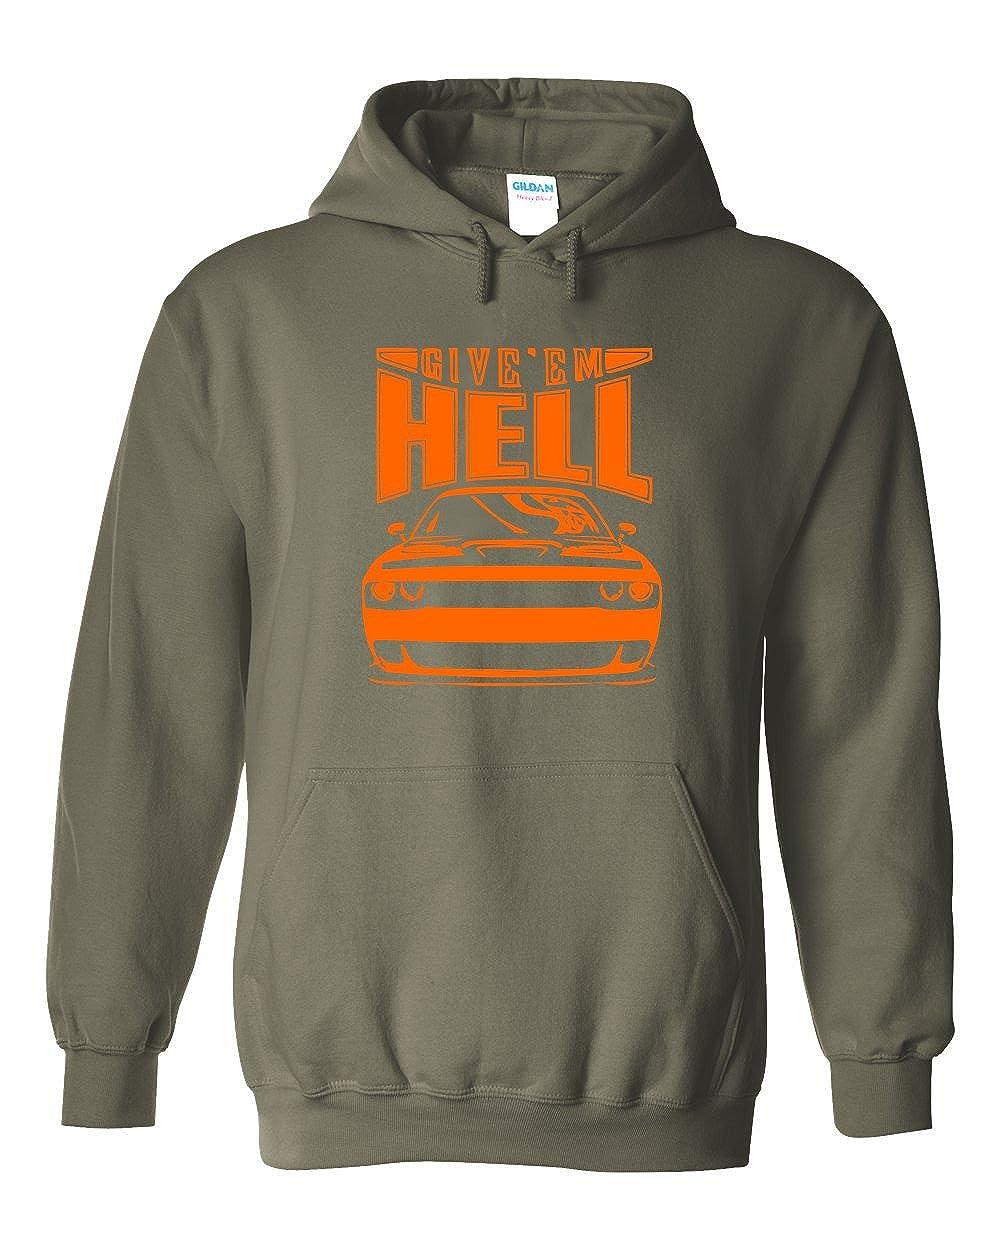 Give Em Hell Womens Hoodie